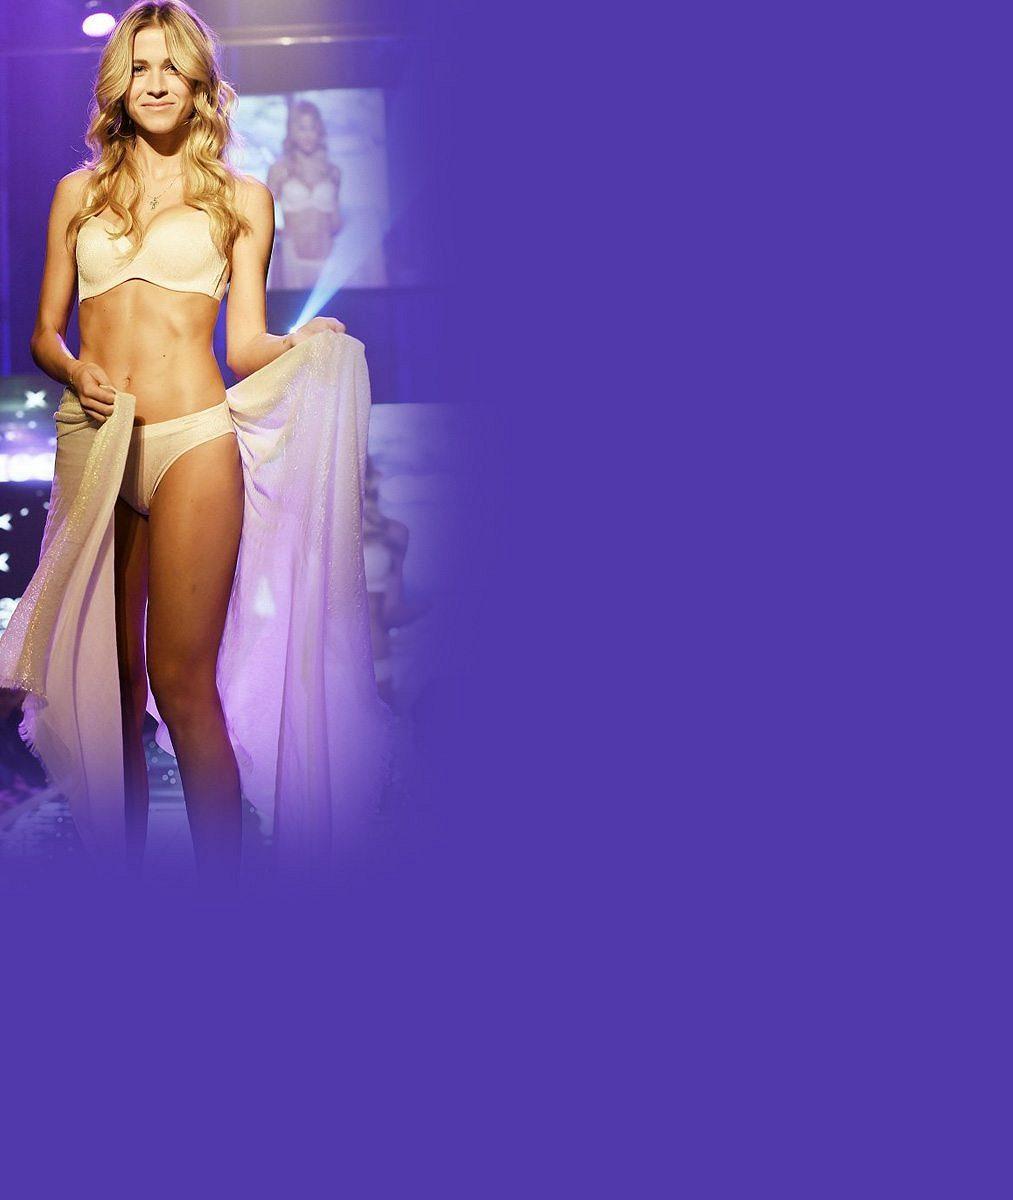 Místo kabátu šla opět do plavek: Krásná Veronika Kopřivová si užívá slunce v Miami!